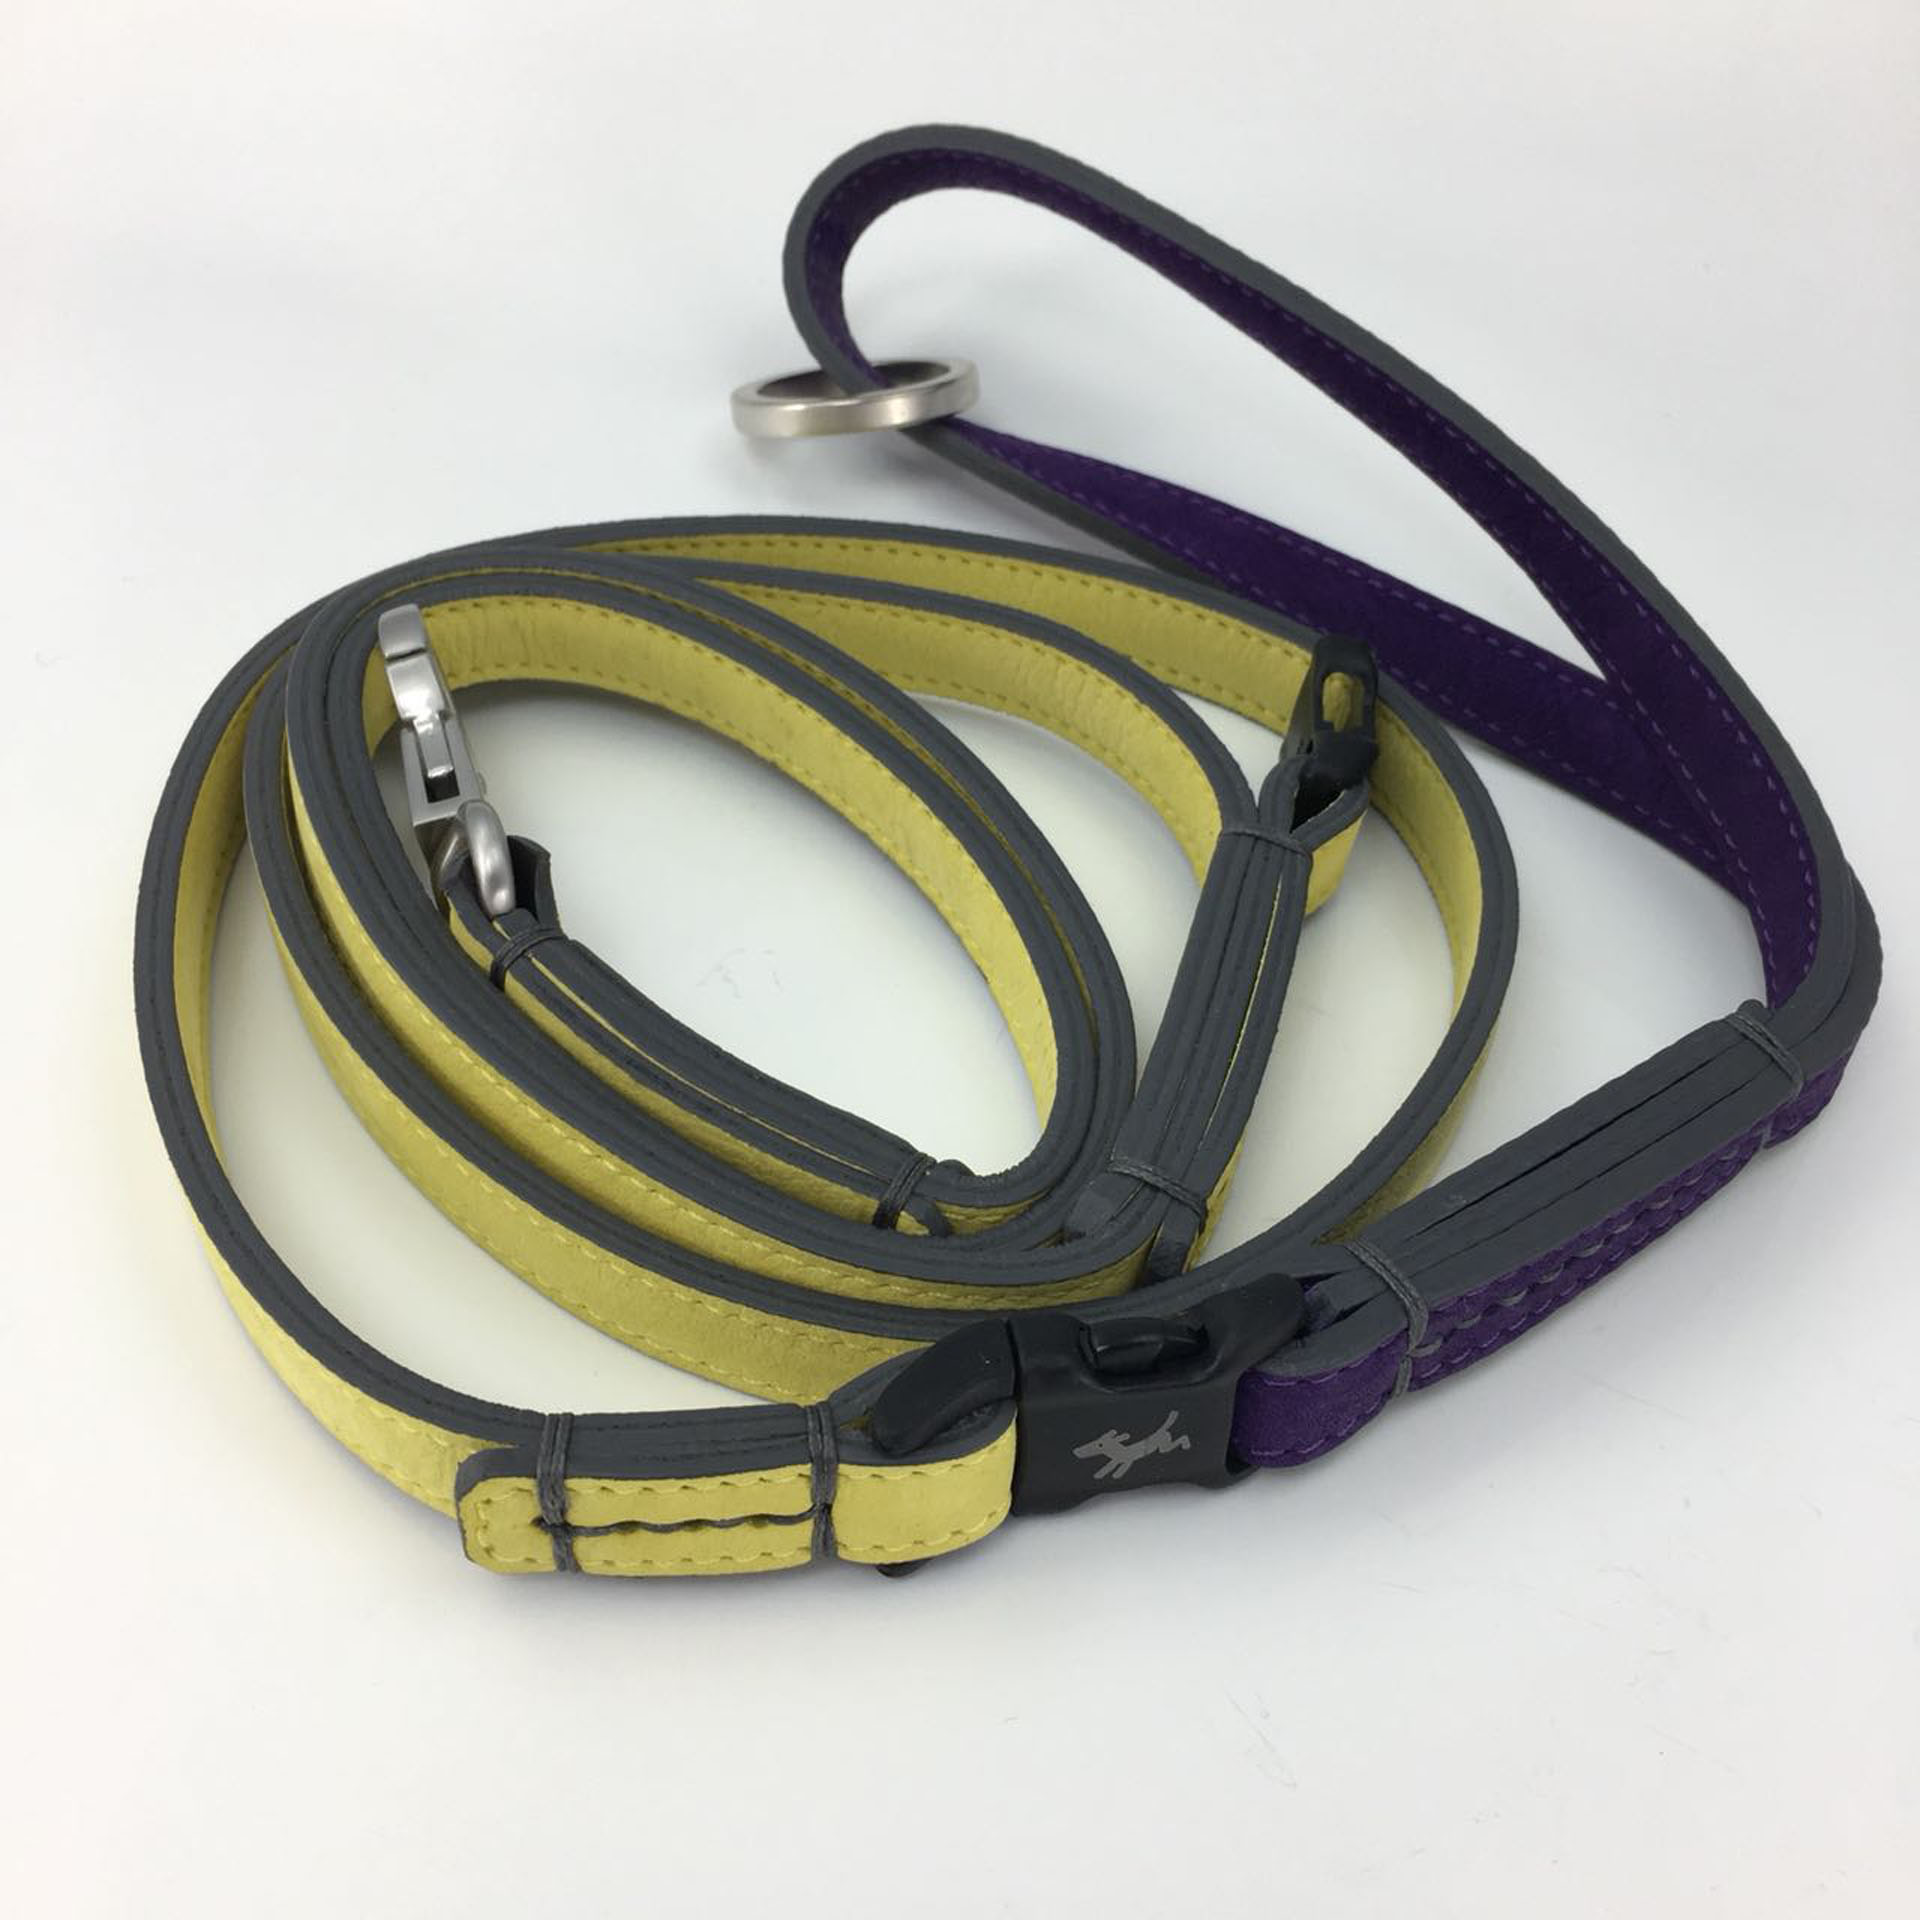 Hundeleine-schröders-hund-lila-gelb